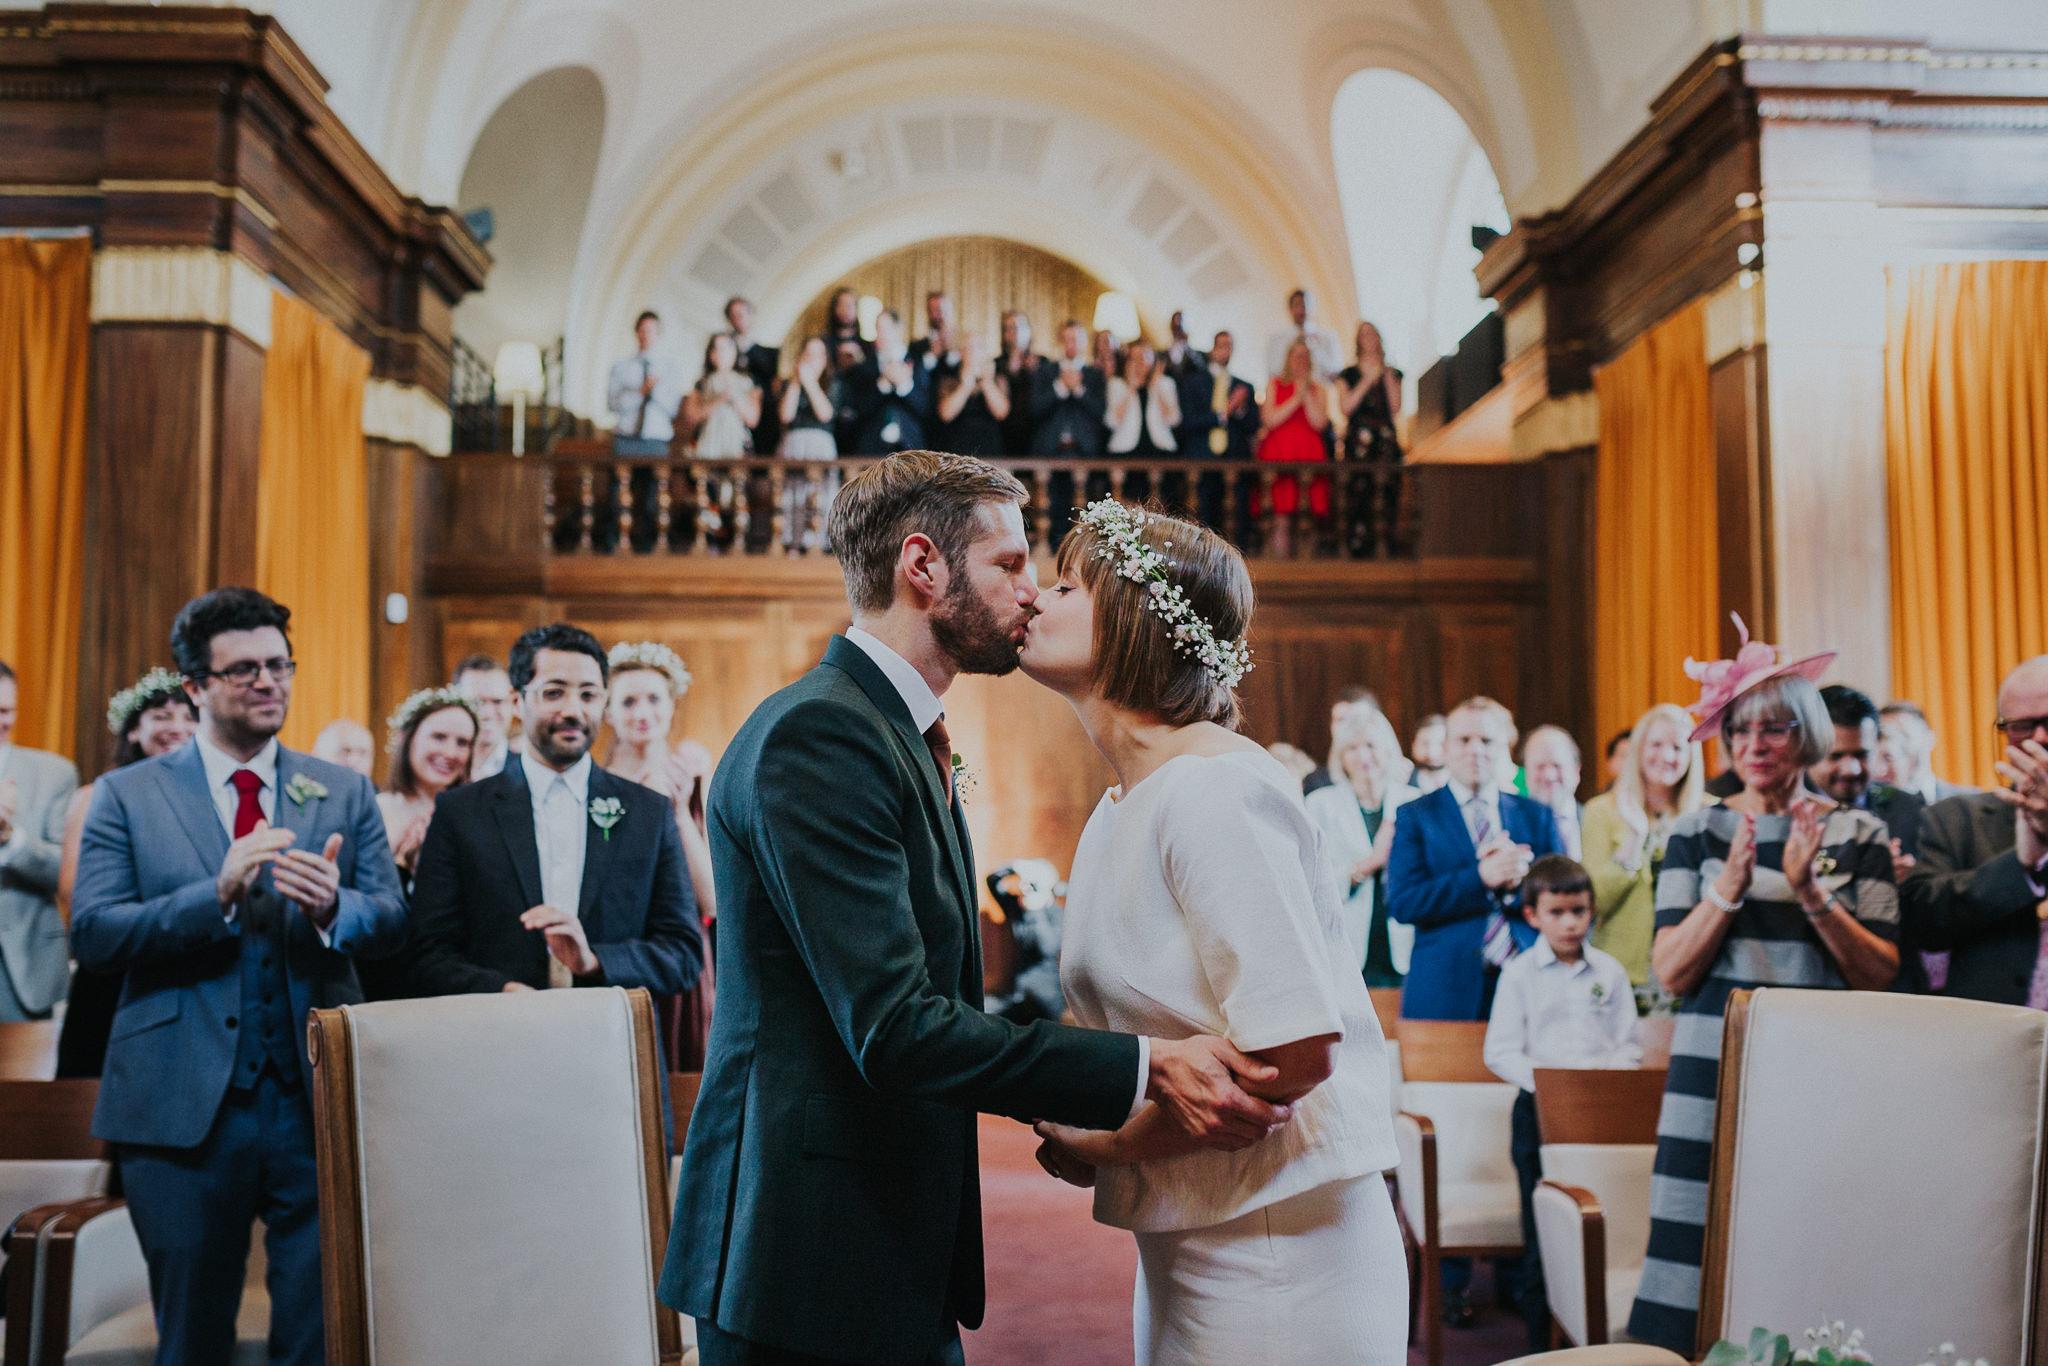 kate-gray-london-wedding-photography-26.jpg